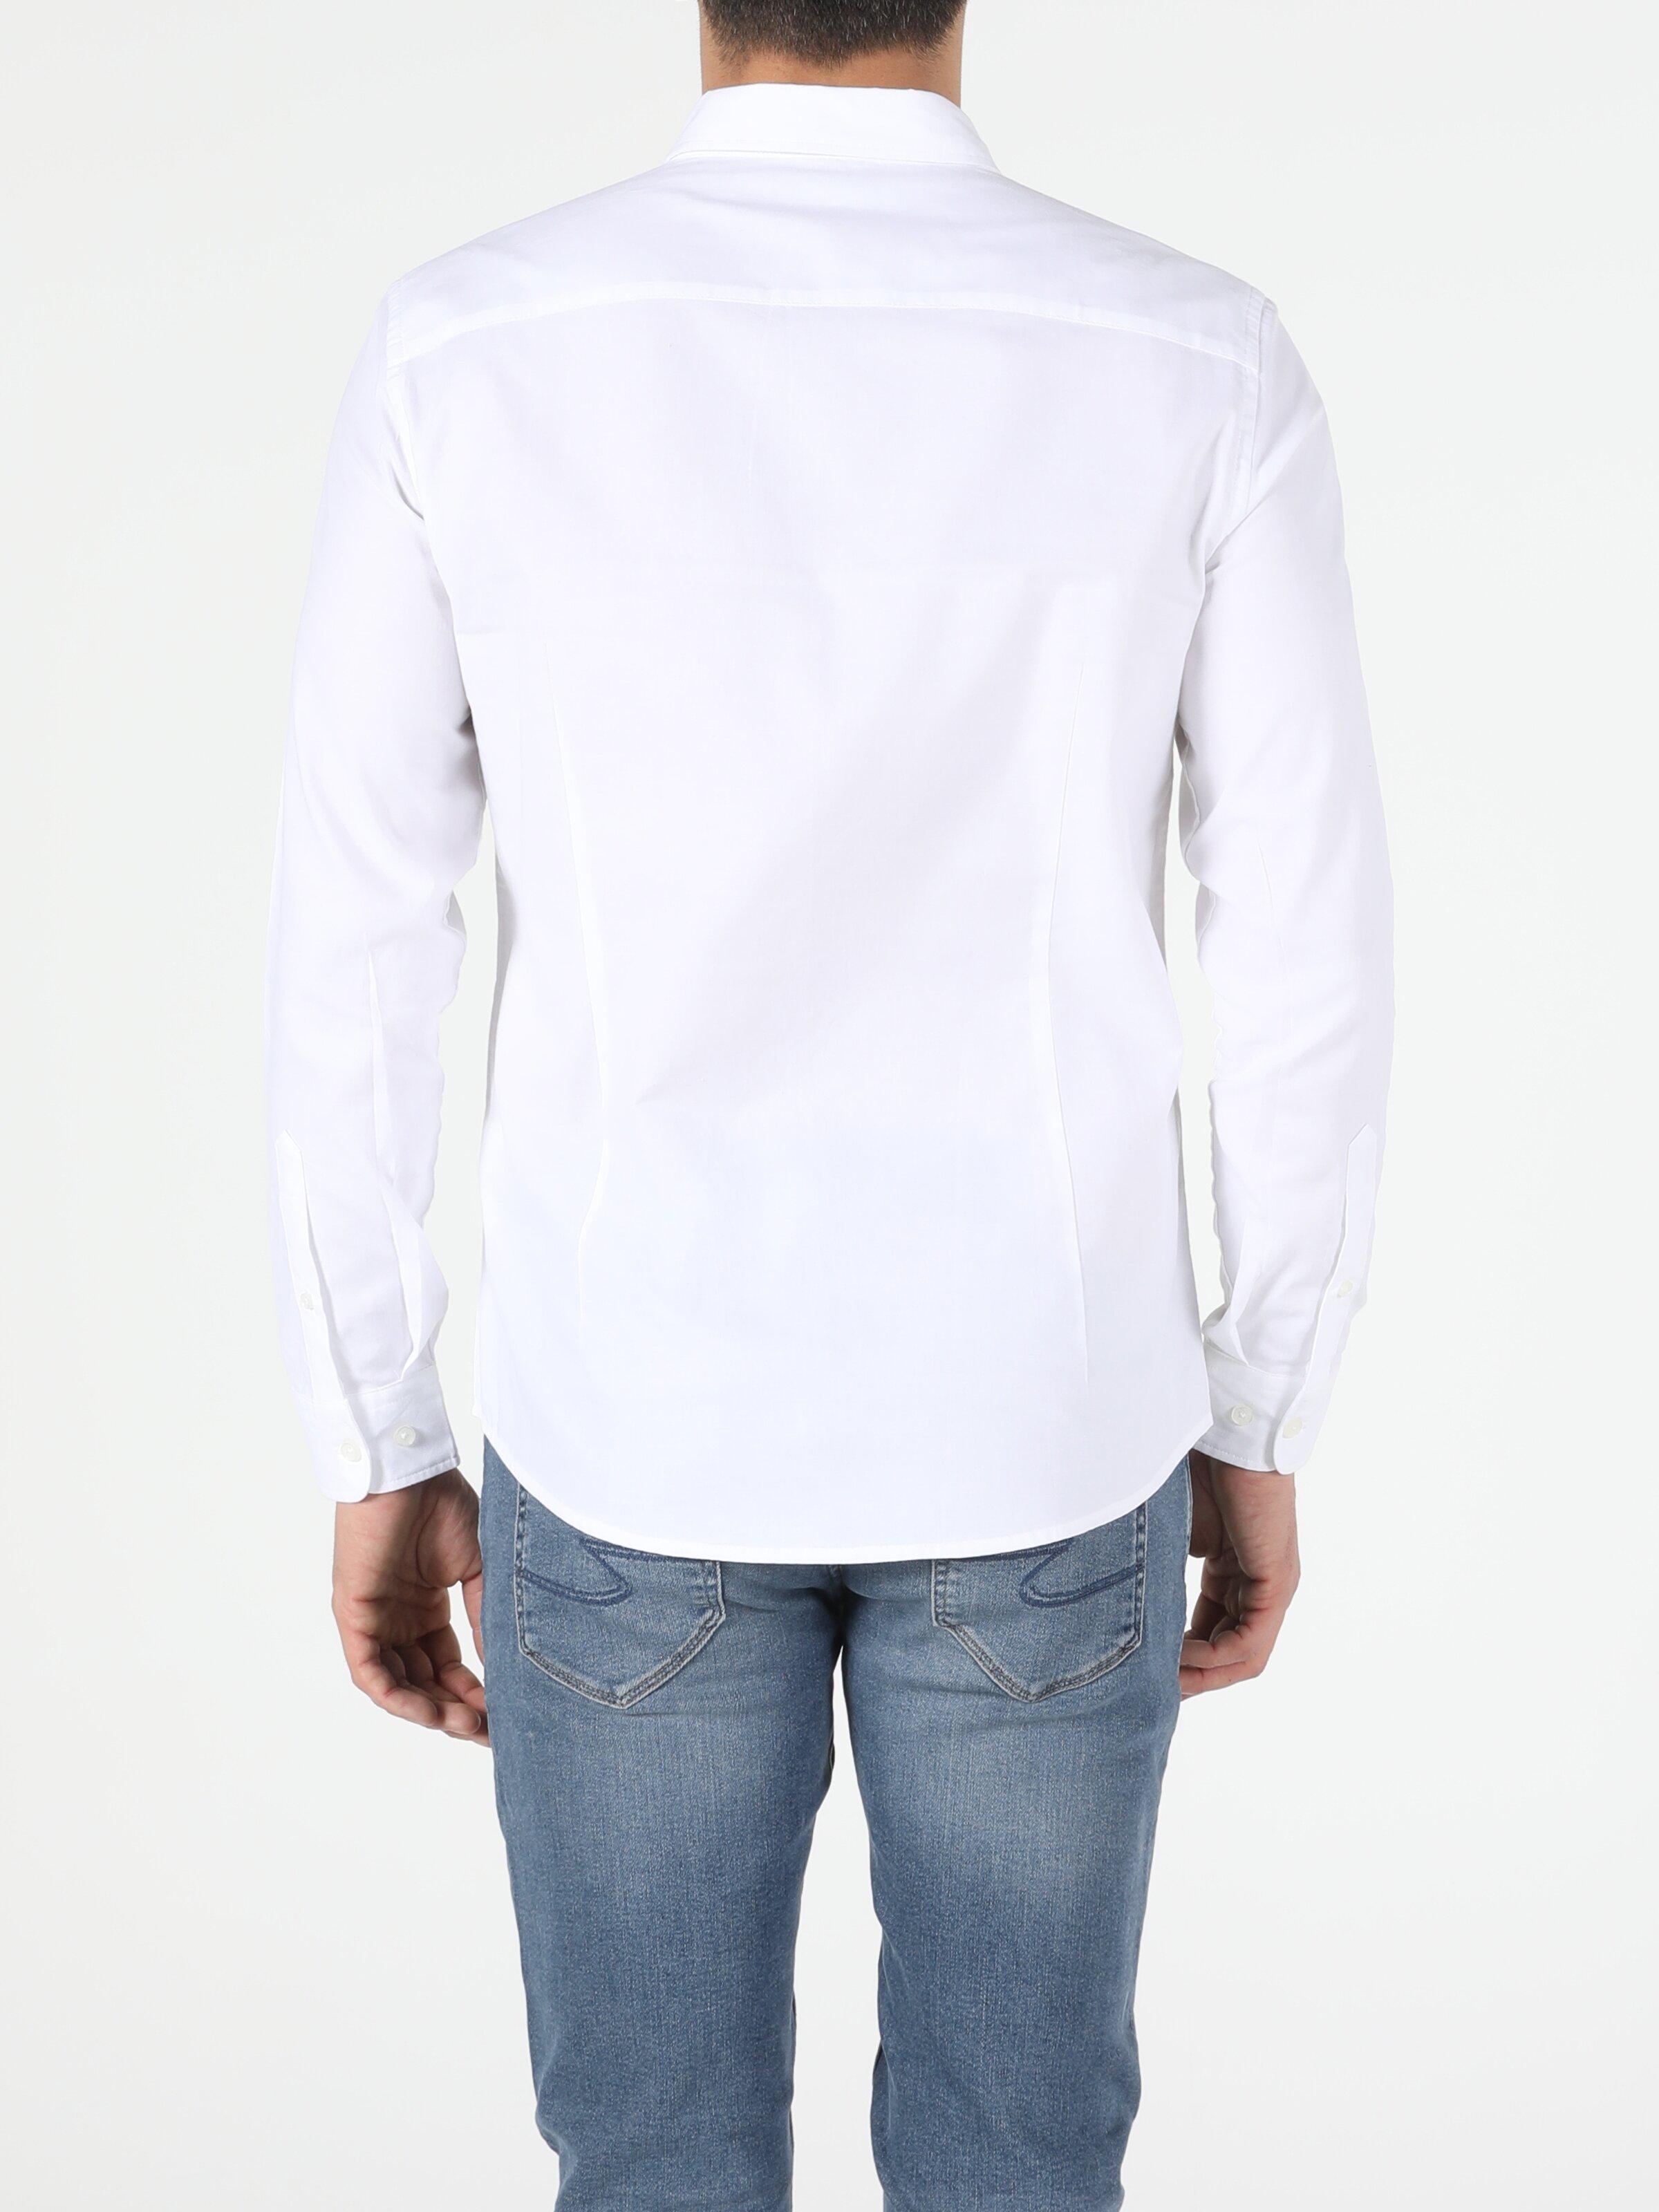 Slim Fit Shirt Neck Erkek Beyaz Uzun Kol Gömlek